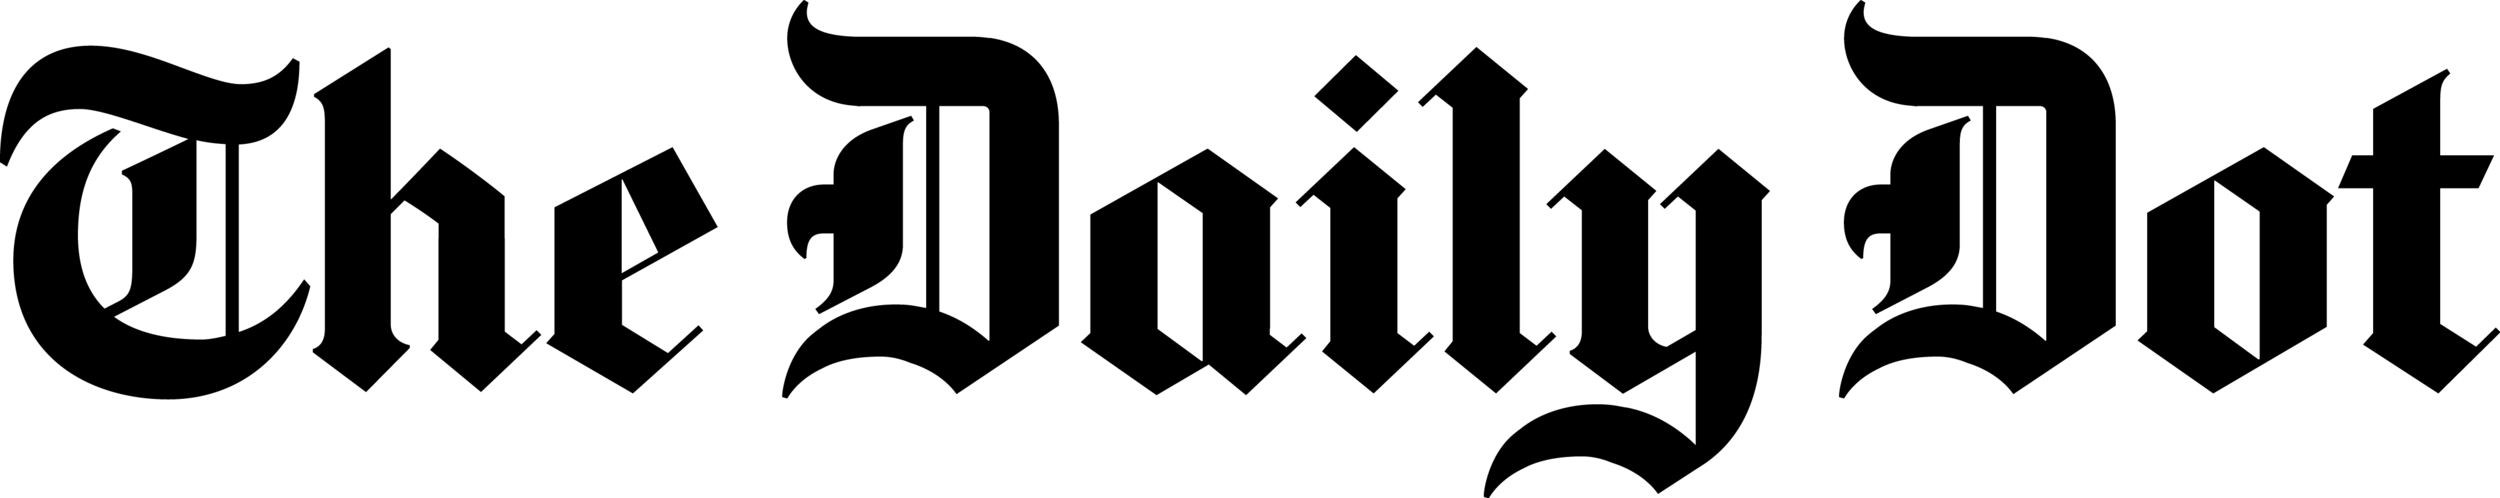 Daily_Dot_logo.png